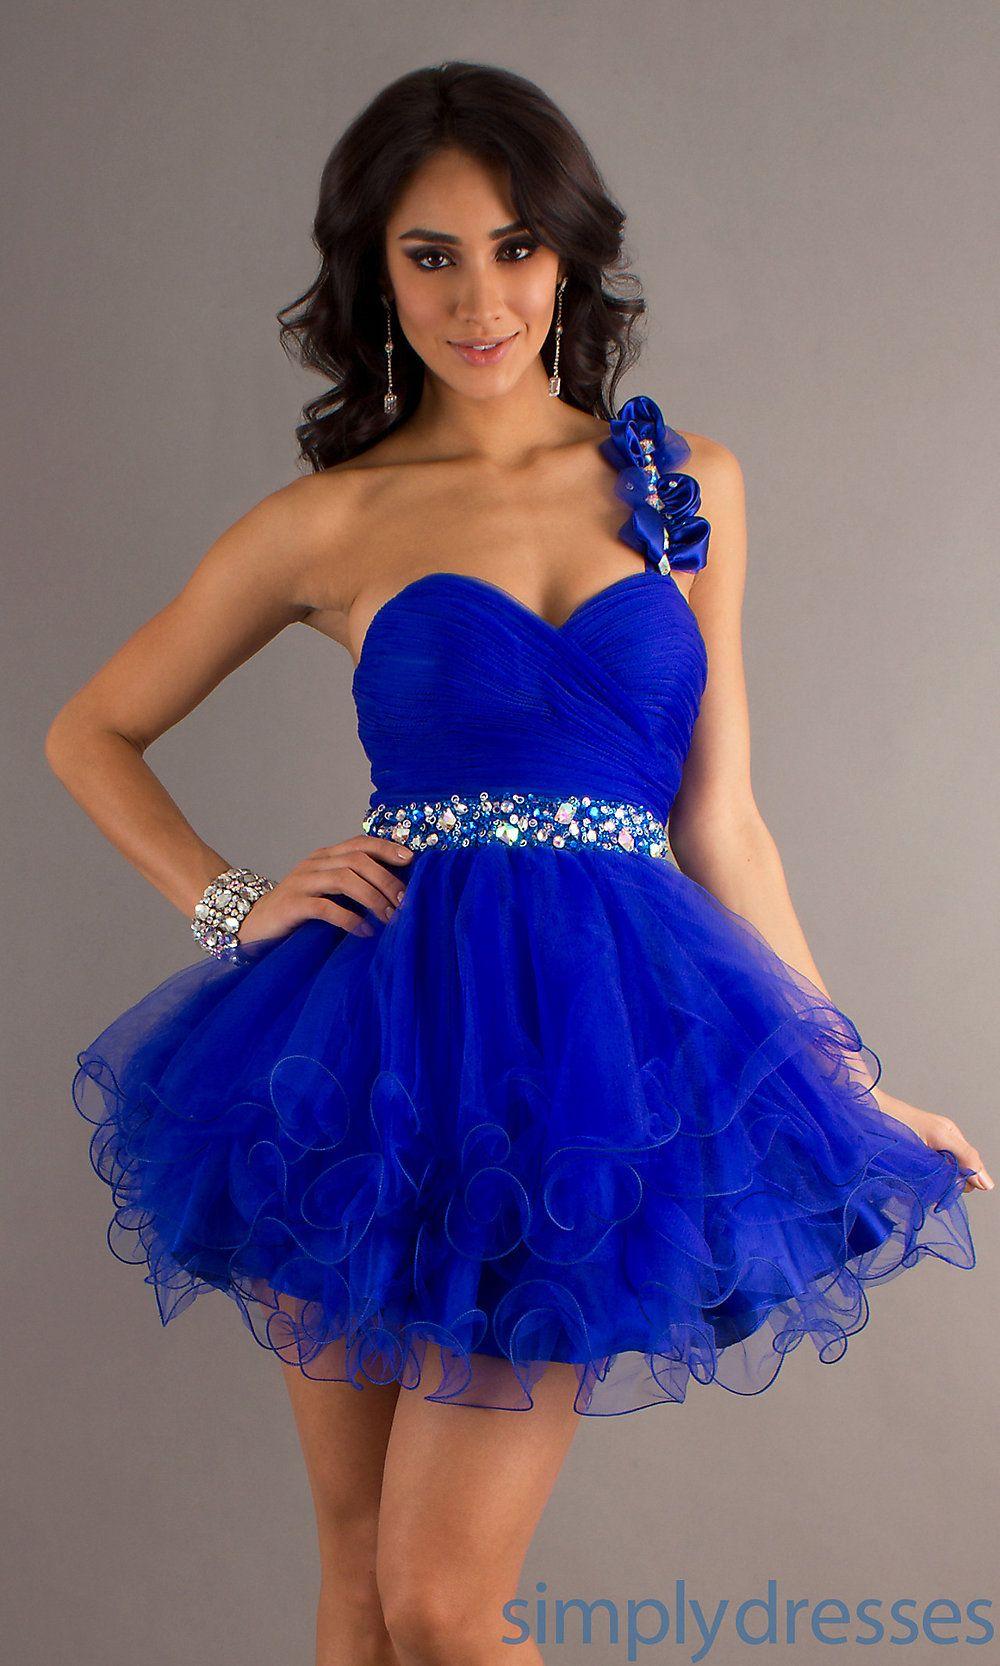 Short prom designer dresses tumblr bing images short prom